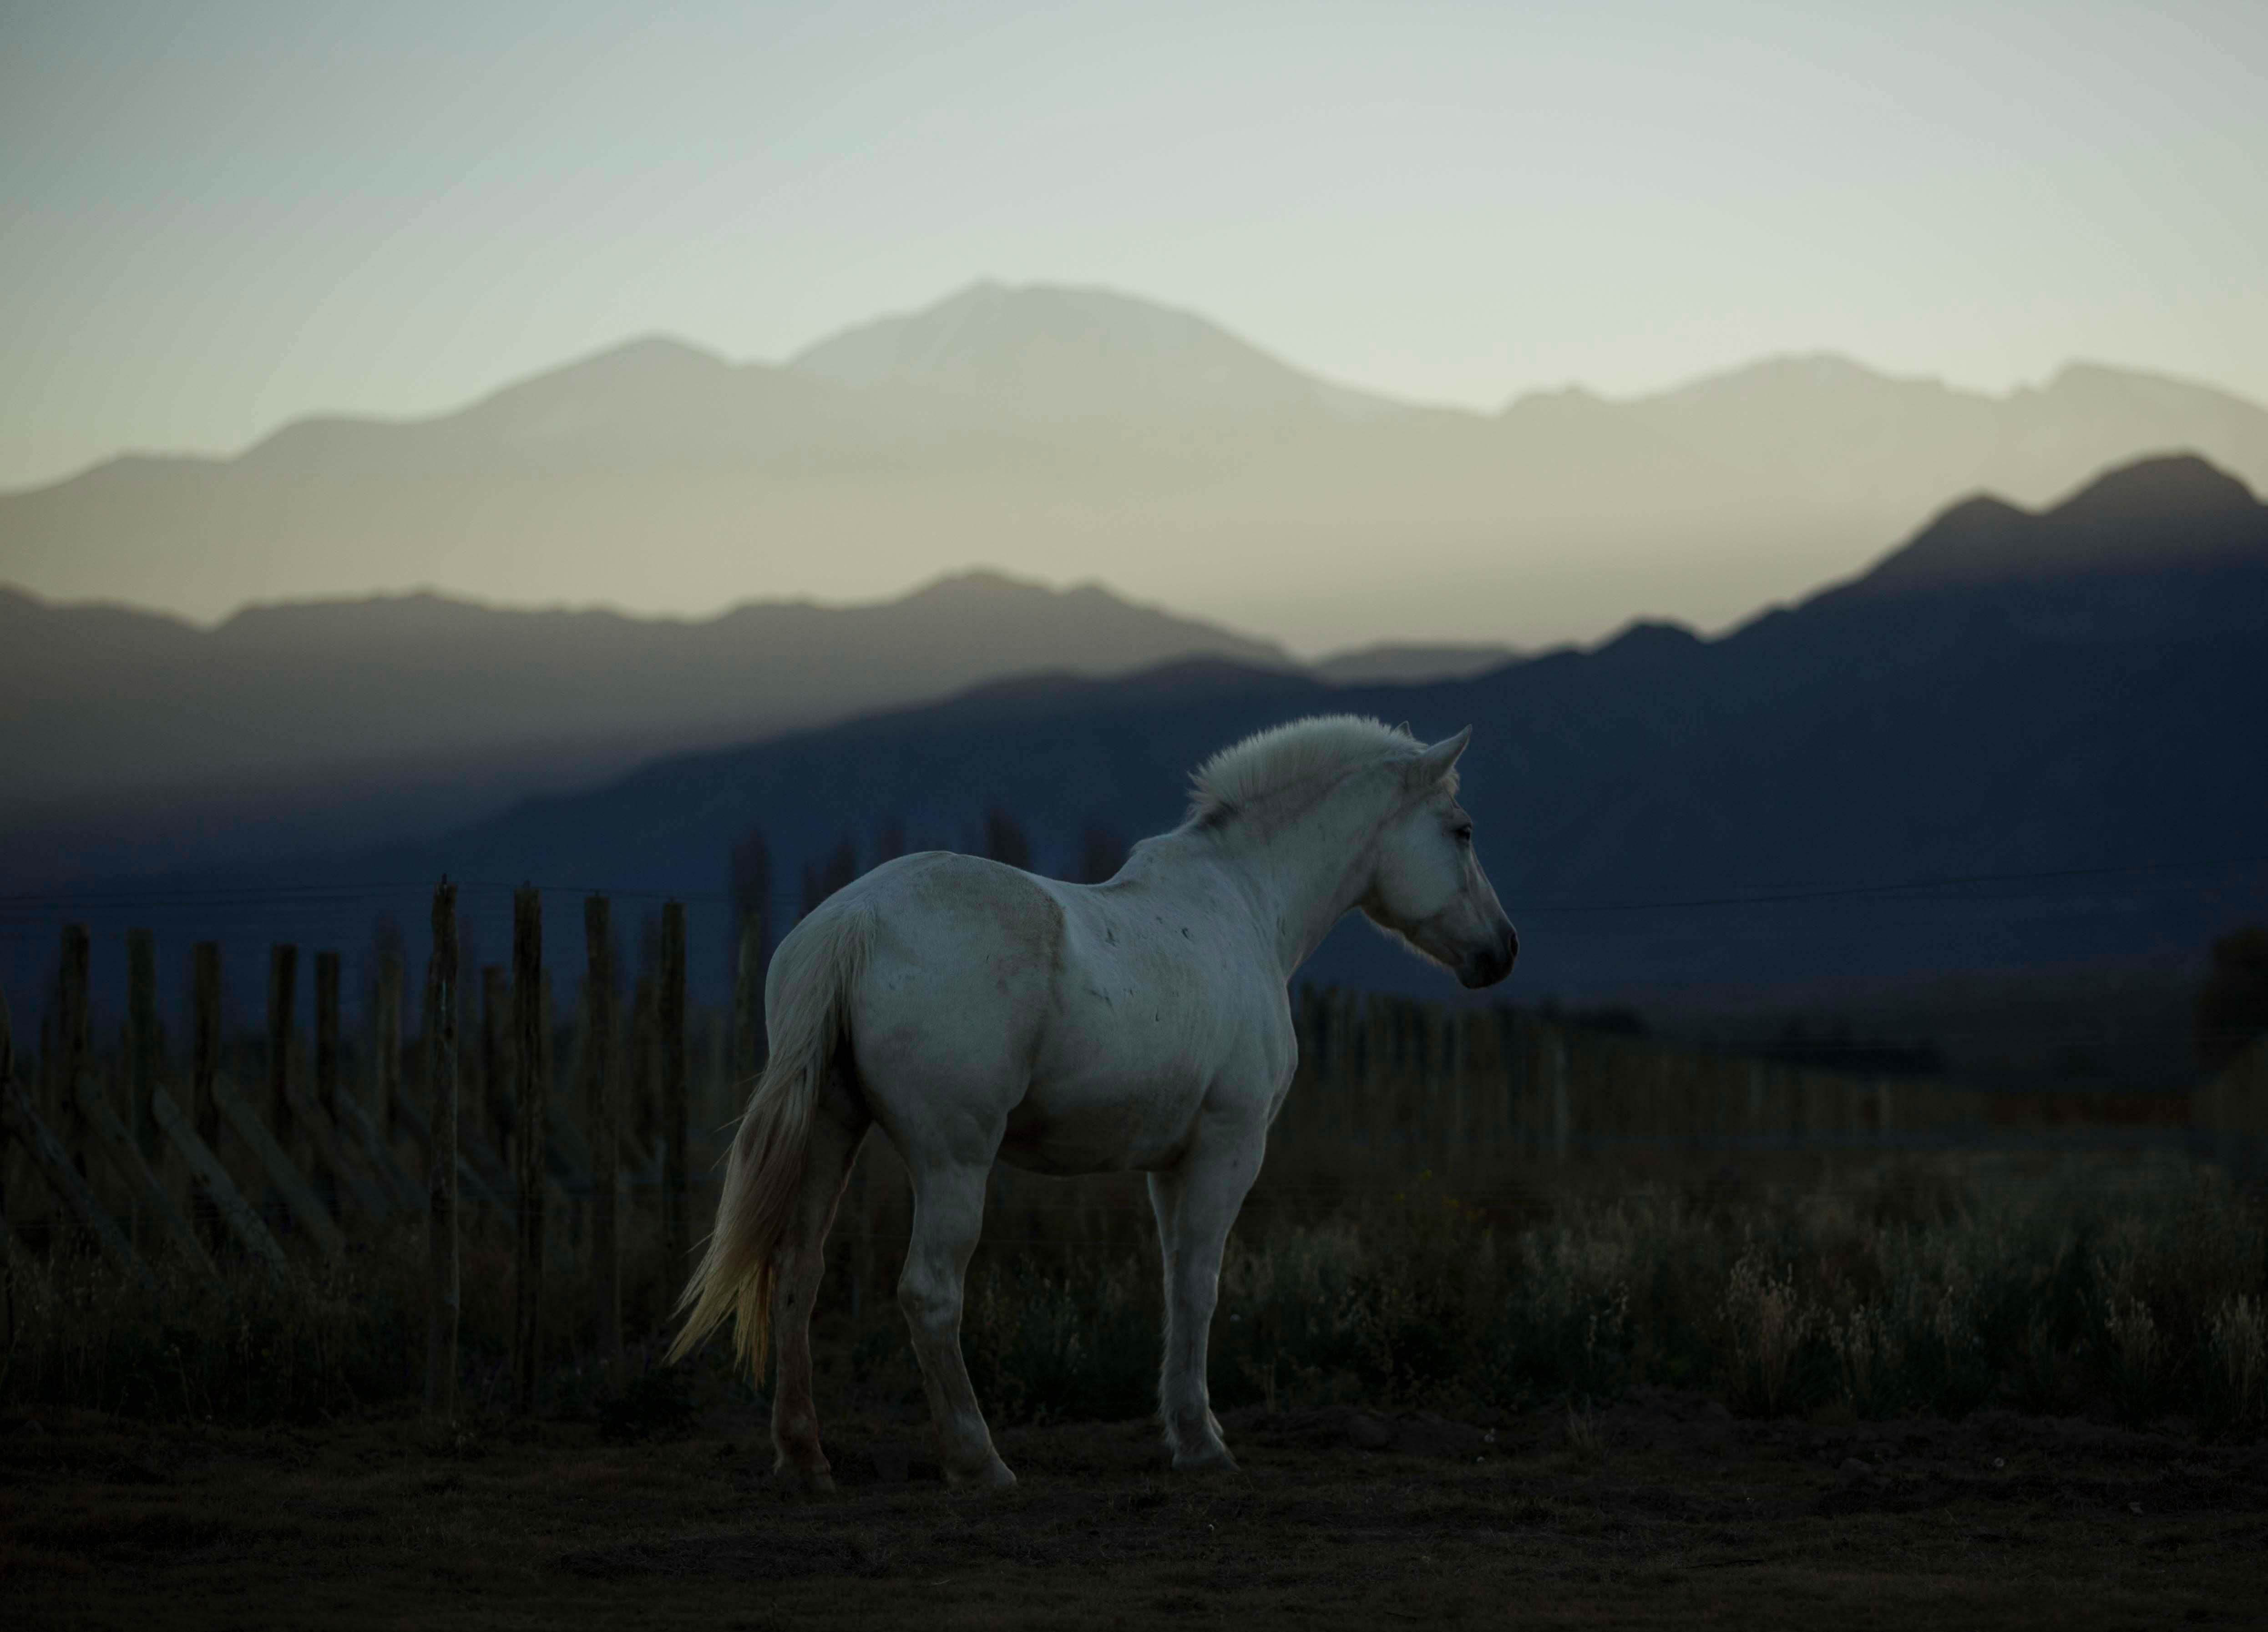 cheval-des-andes-pferdxR9C6p9c8Xx8Y